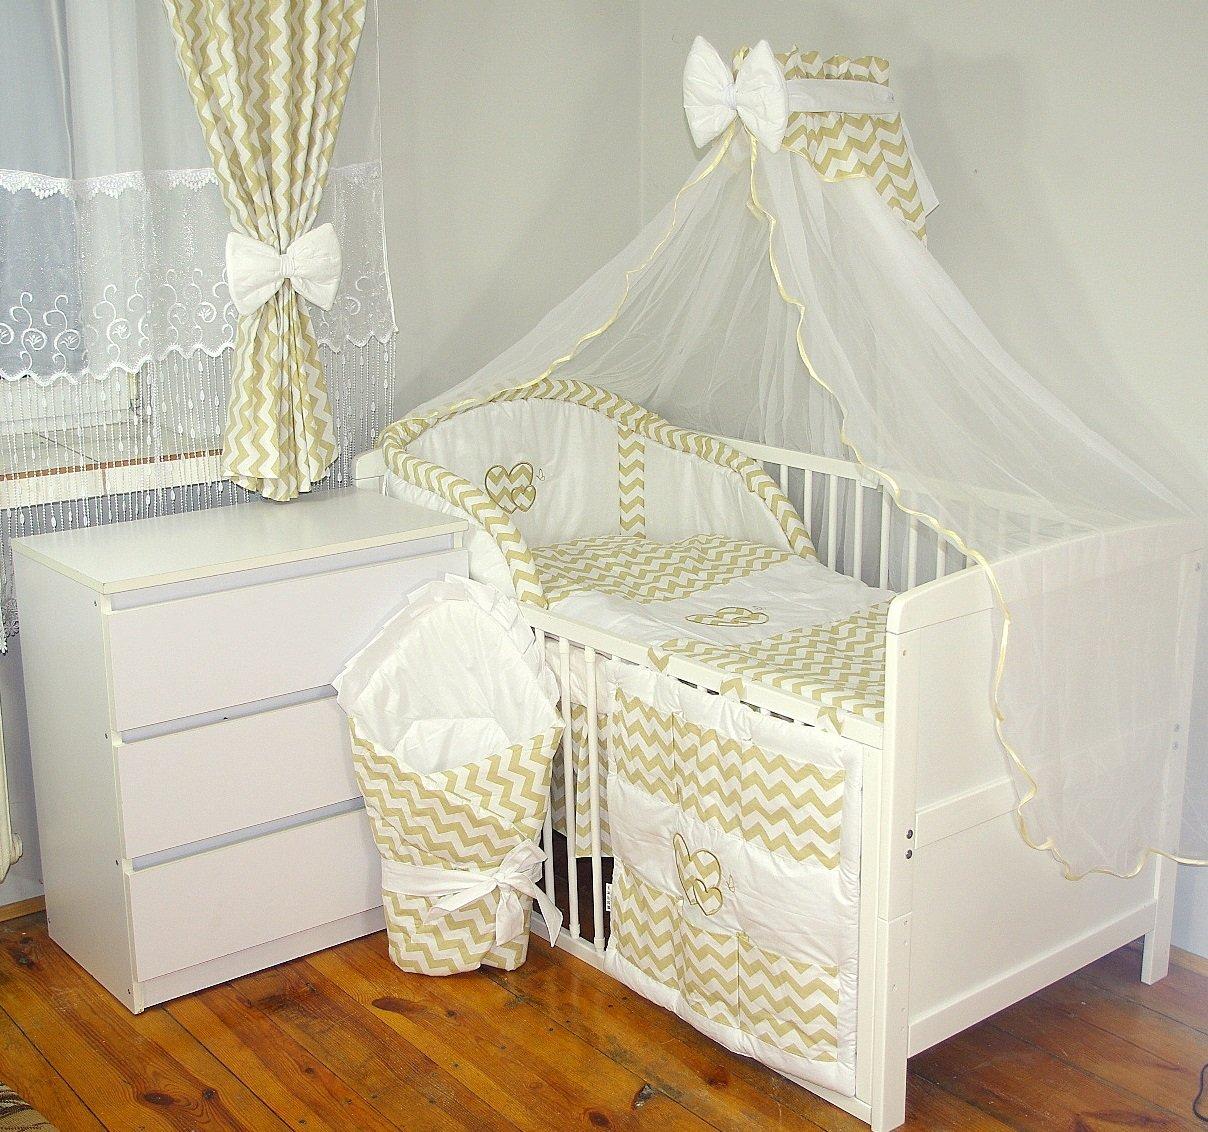 Baby's Comfort 24tlg BABY BETTWÄ SCHE BETTSET MIT STICKEREI (12 FARBEN) ( fü rs BABYBETT 120/60 cm, 1) Baby' s Comfort